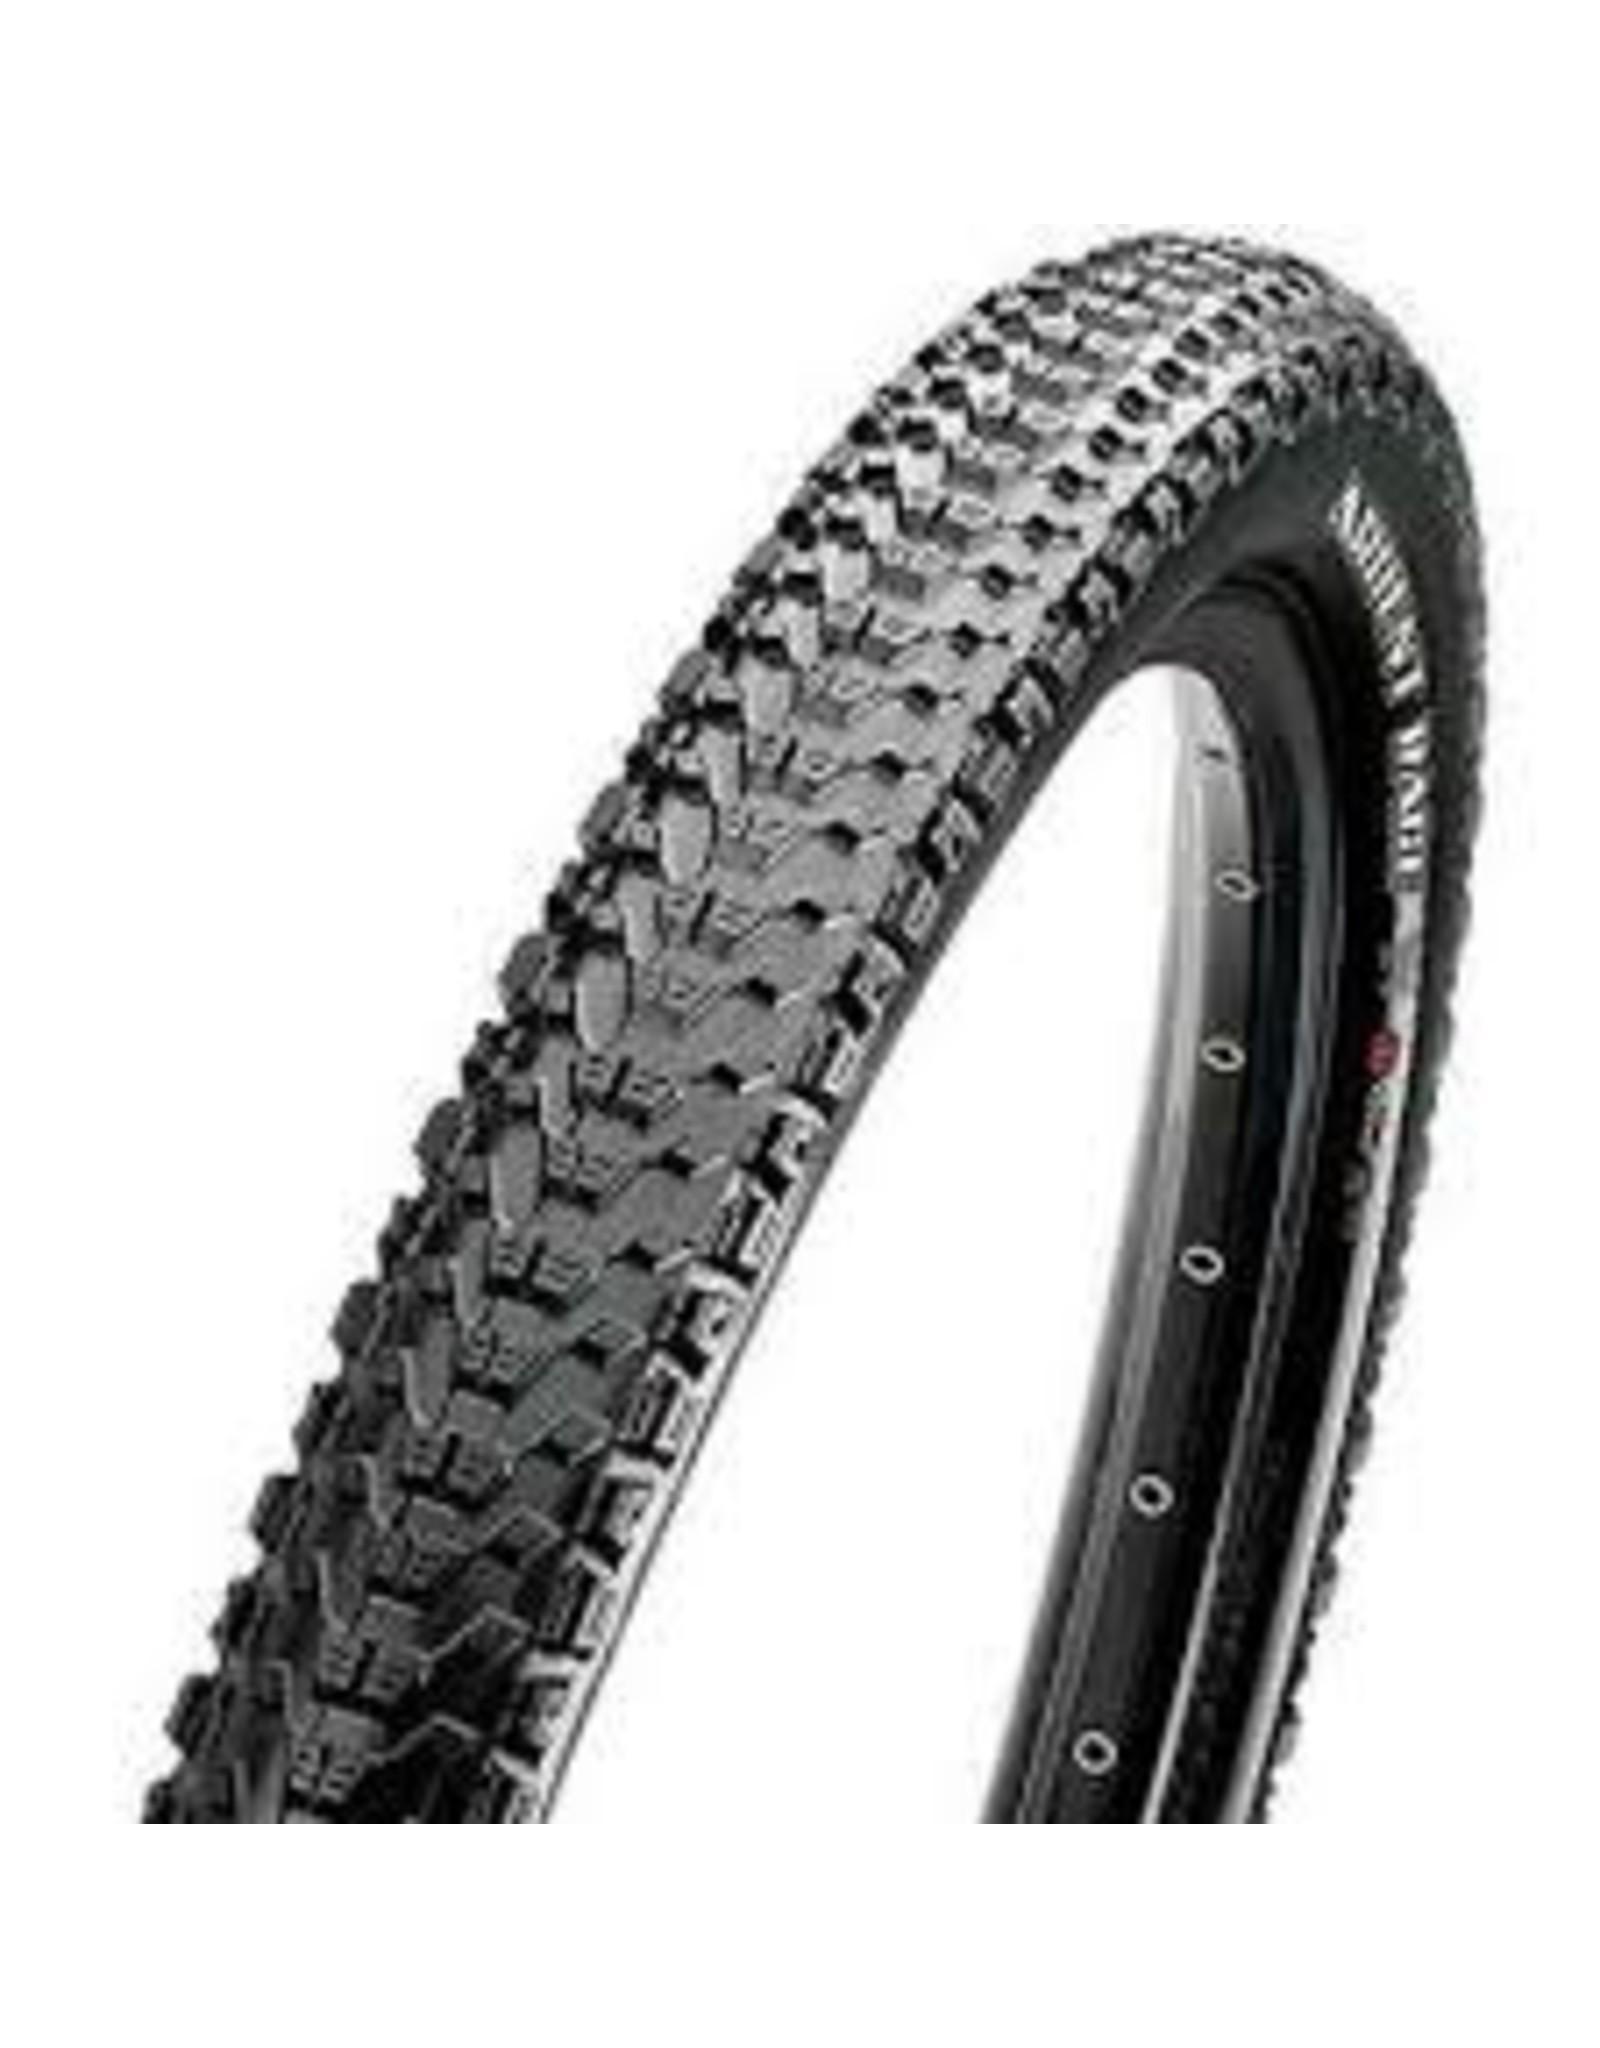 Maxxis Ardent Race 29 x 2.20 Tire, Folding, 120tpi, 3C, EXO, Tubeless Ready